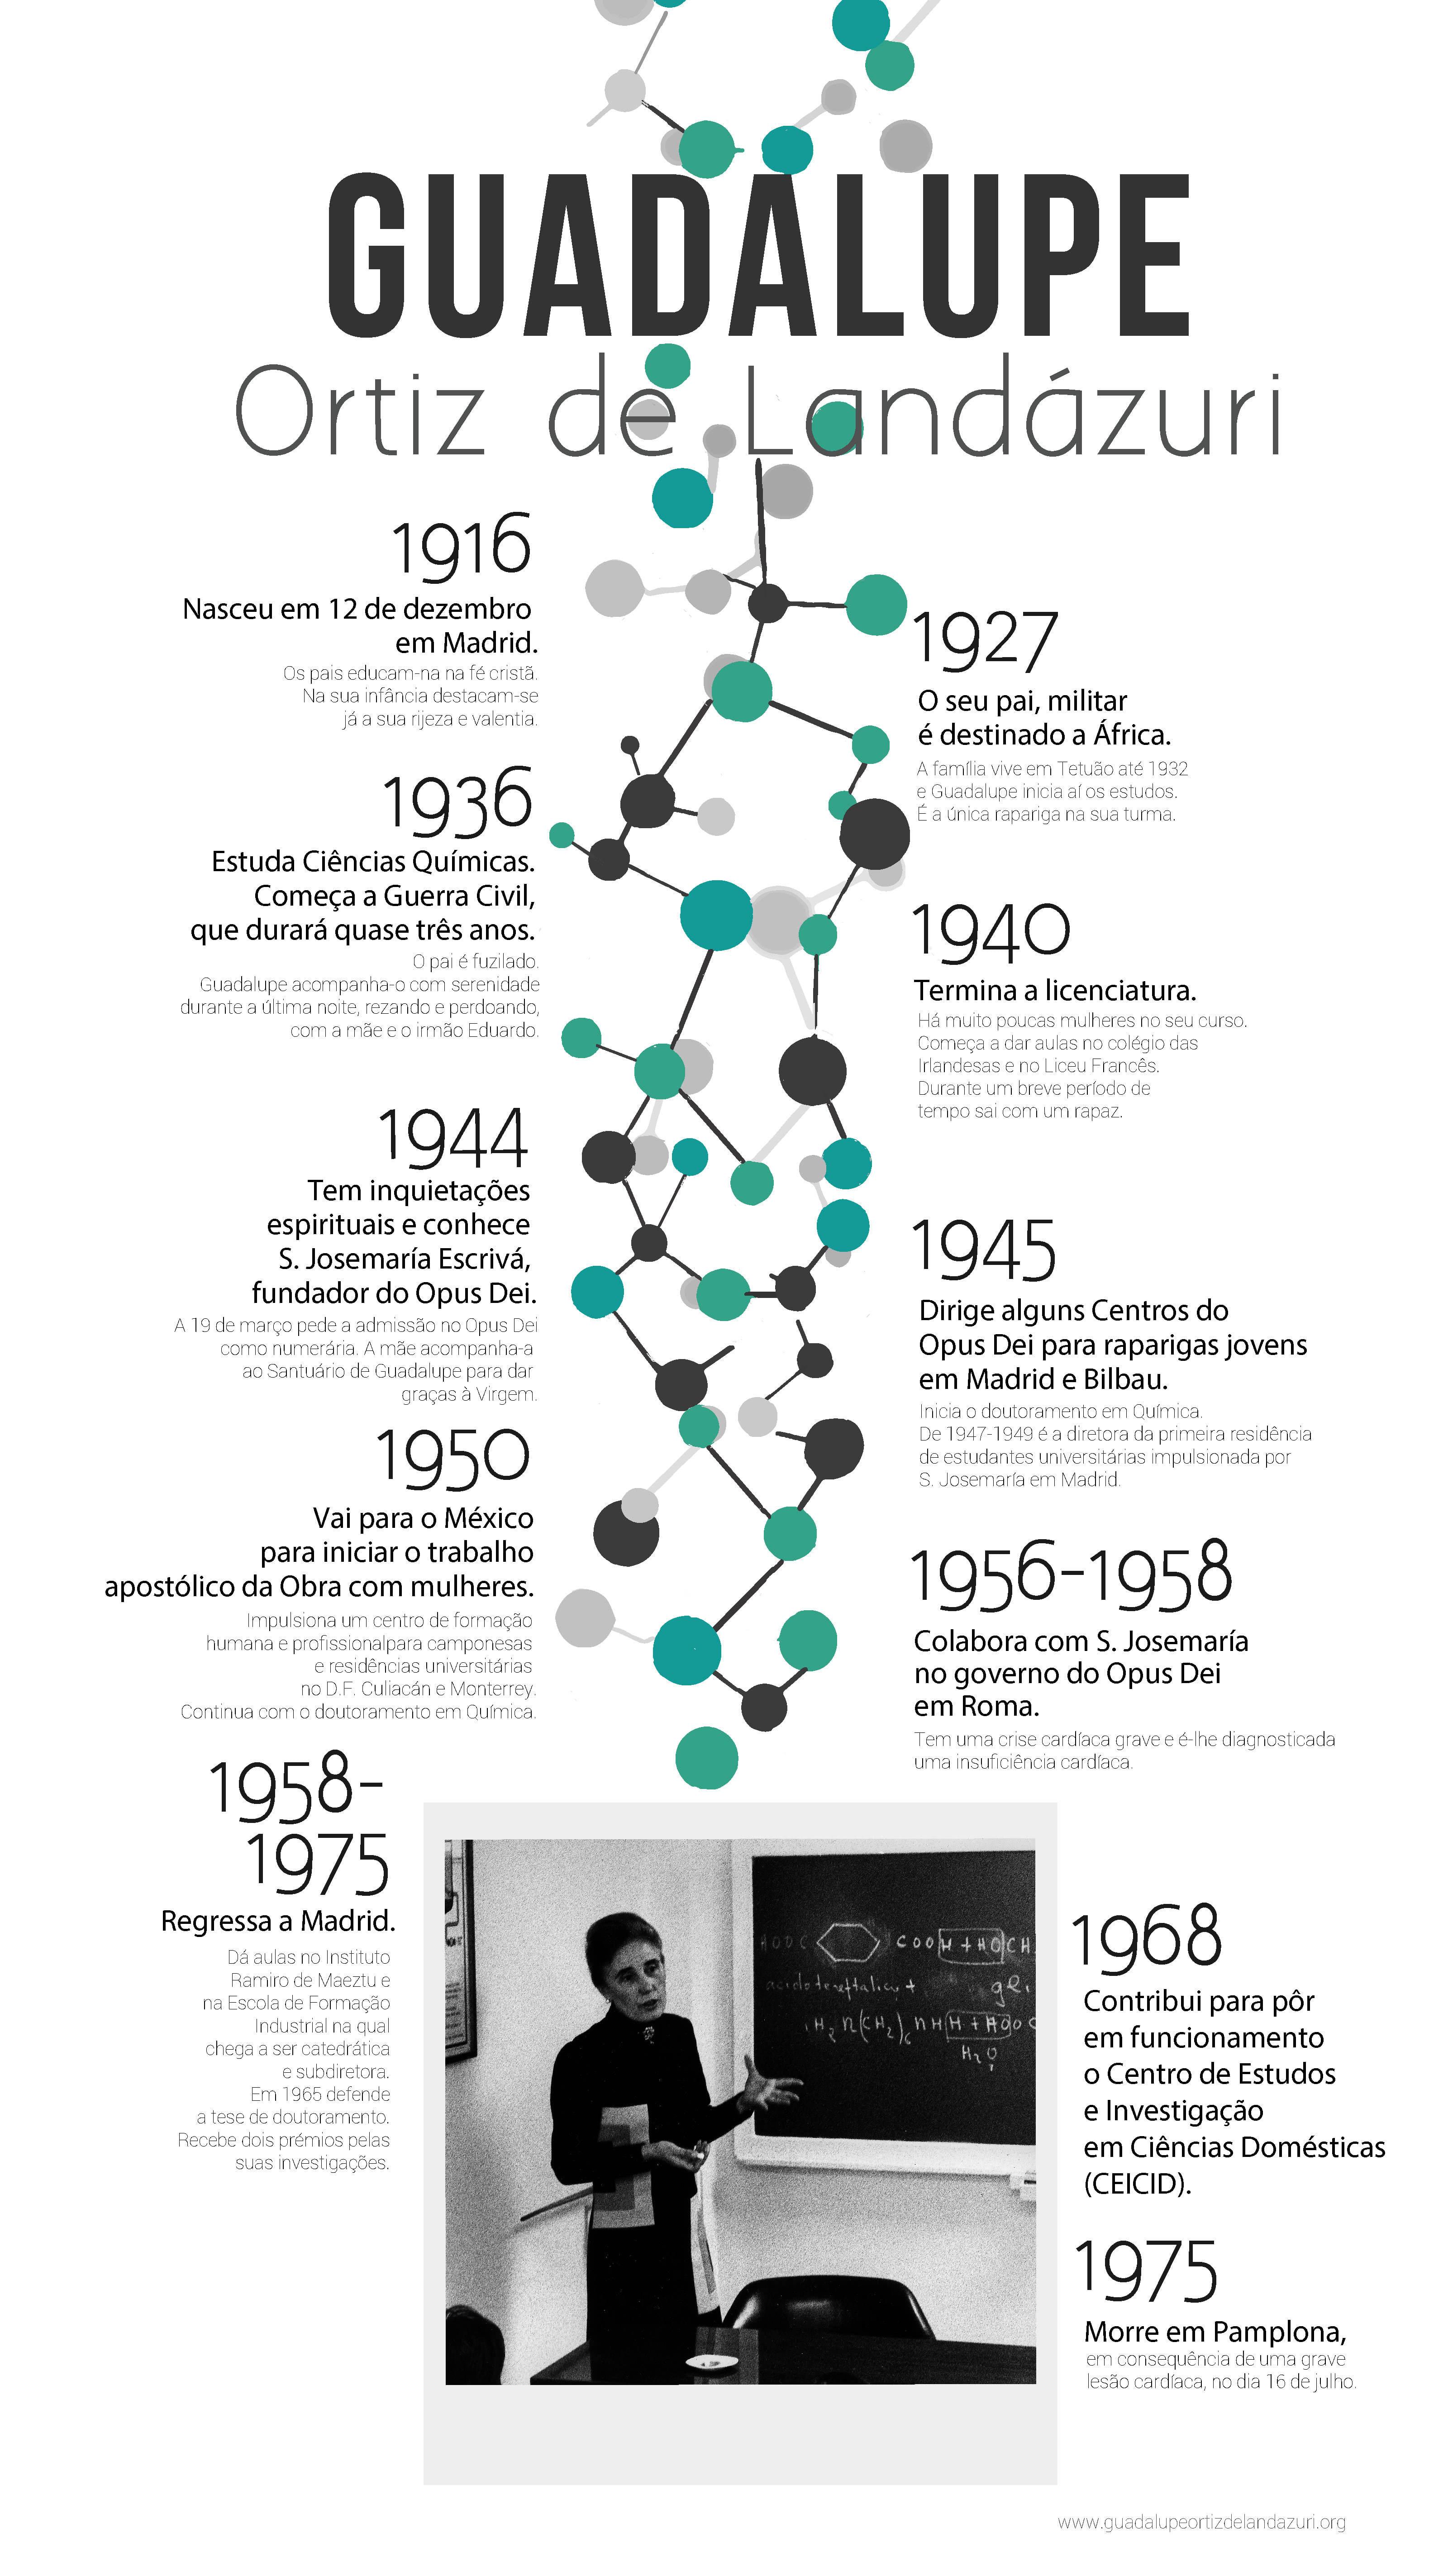 Infográfico sobre Guadalupe Ortiz de Landázuri